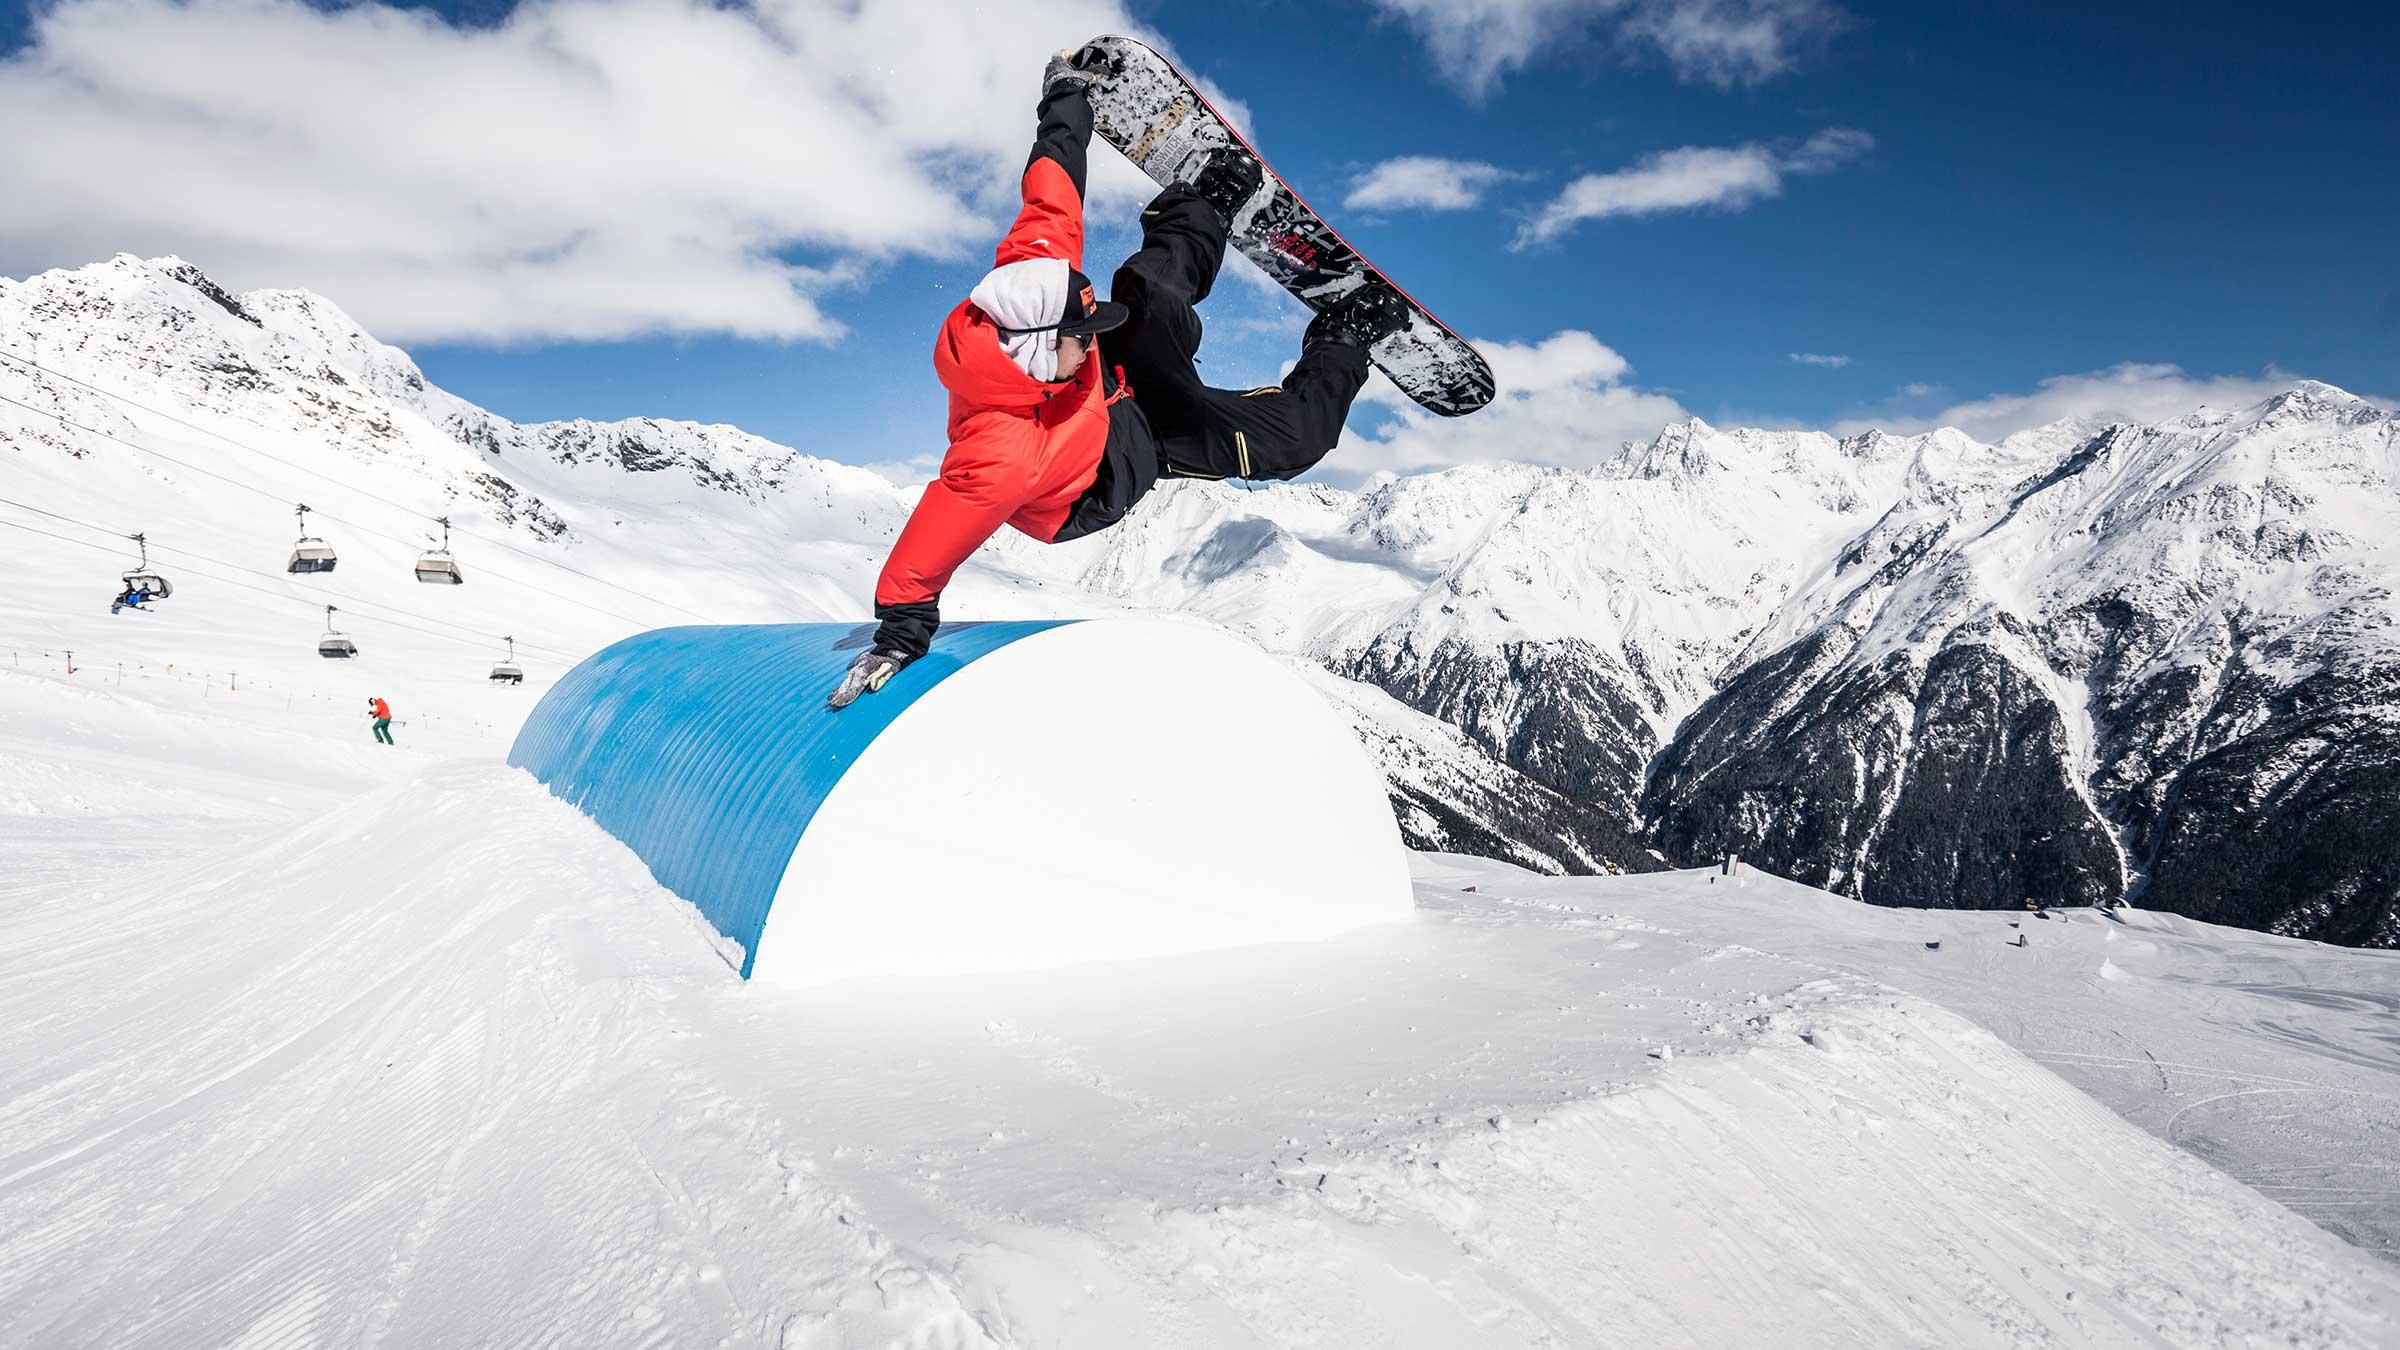 Snowboarder im Snowpark - AREA 47 Snowpark Sölden